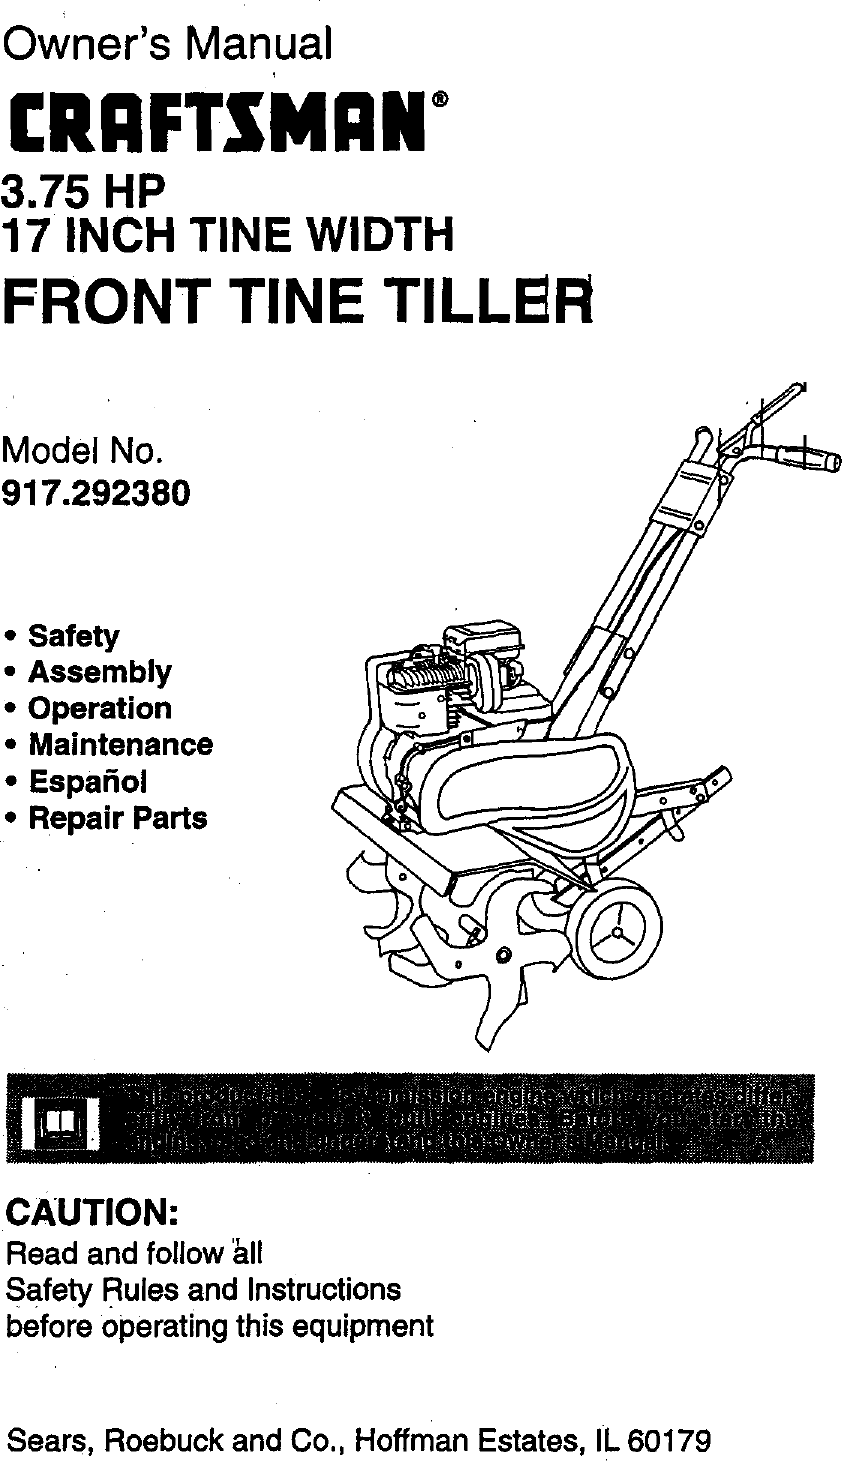 Craftsman 917292380 User Manual TILLER Manuals And Guides